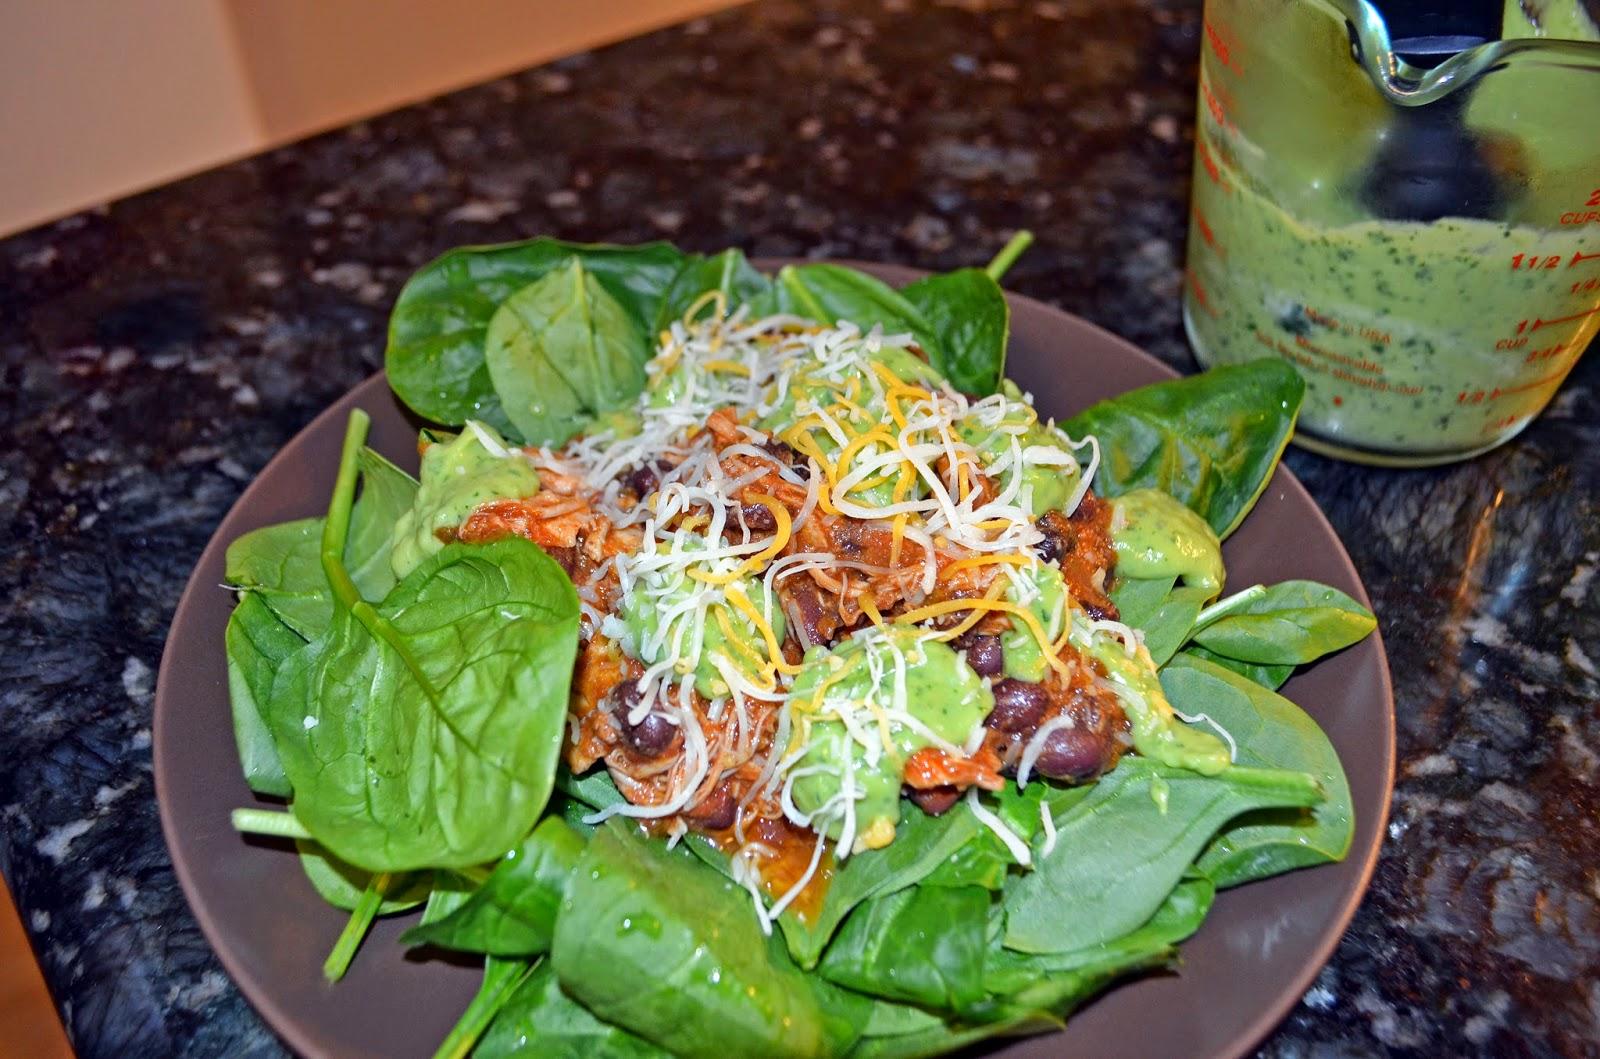 ... taco salad with a zesty avocado cilantro buttermilk dressing. Amazing